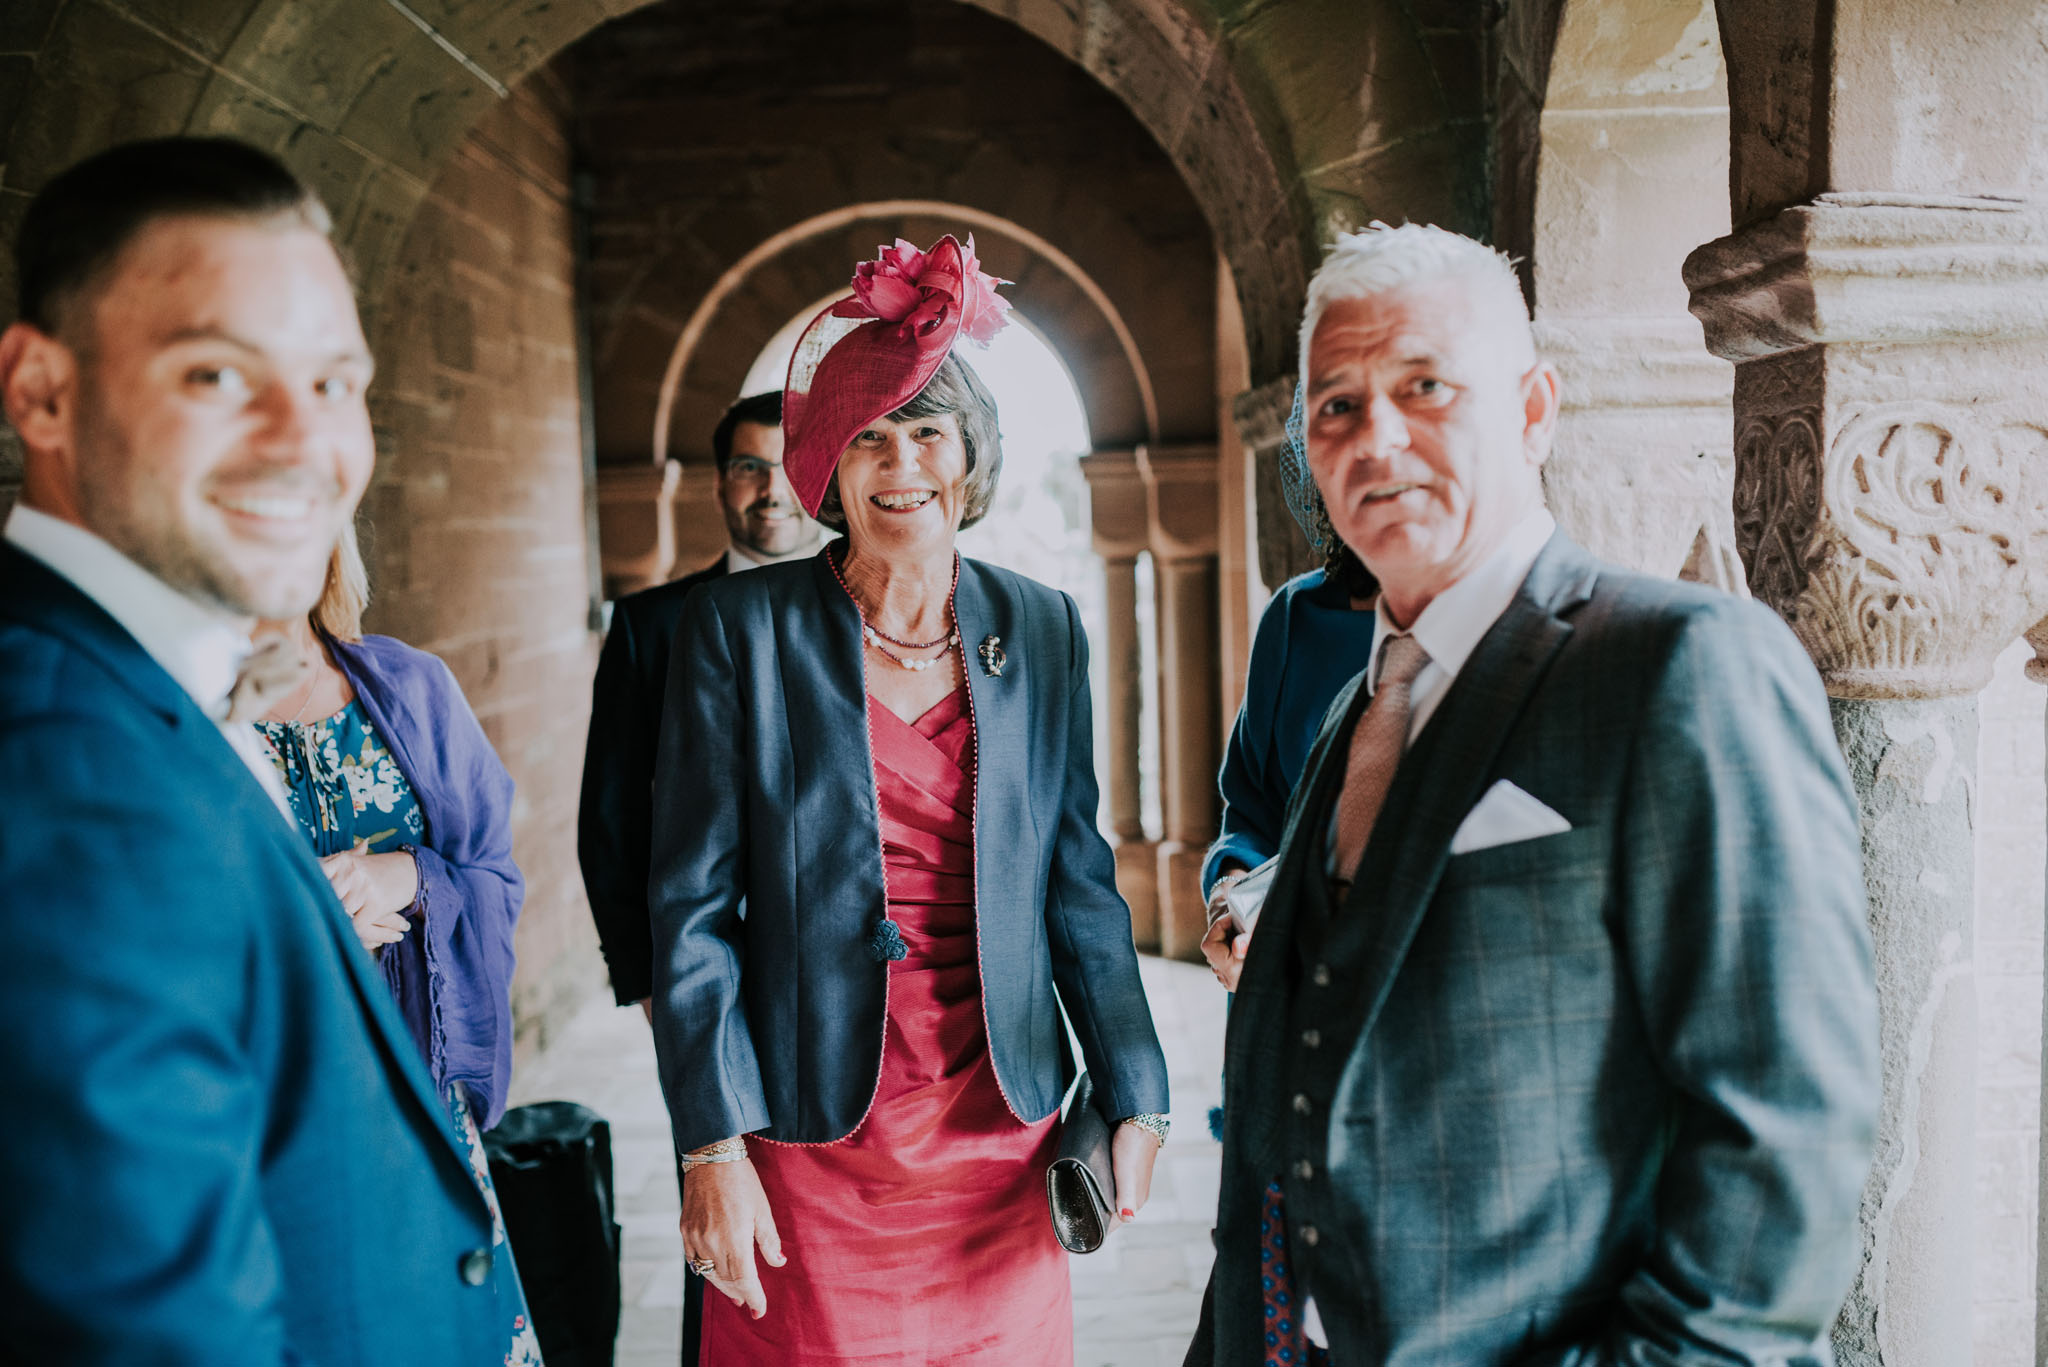 wedding-photographer-glewstone-court-hereford-scott-stockwell-photography098.jpg